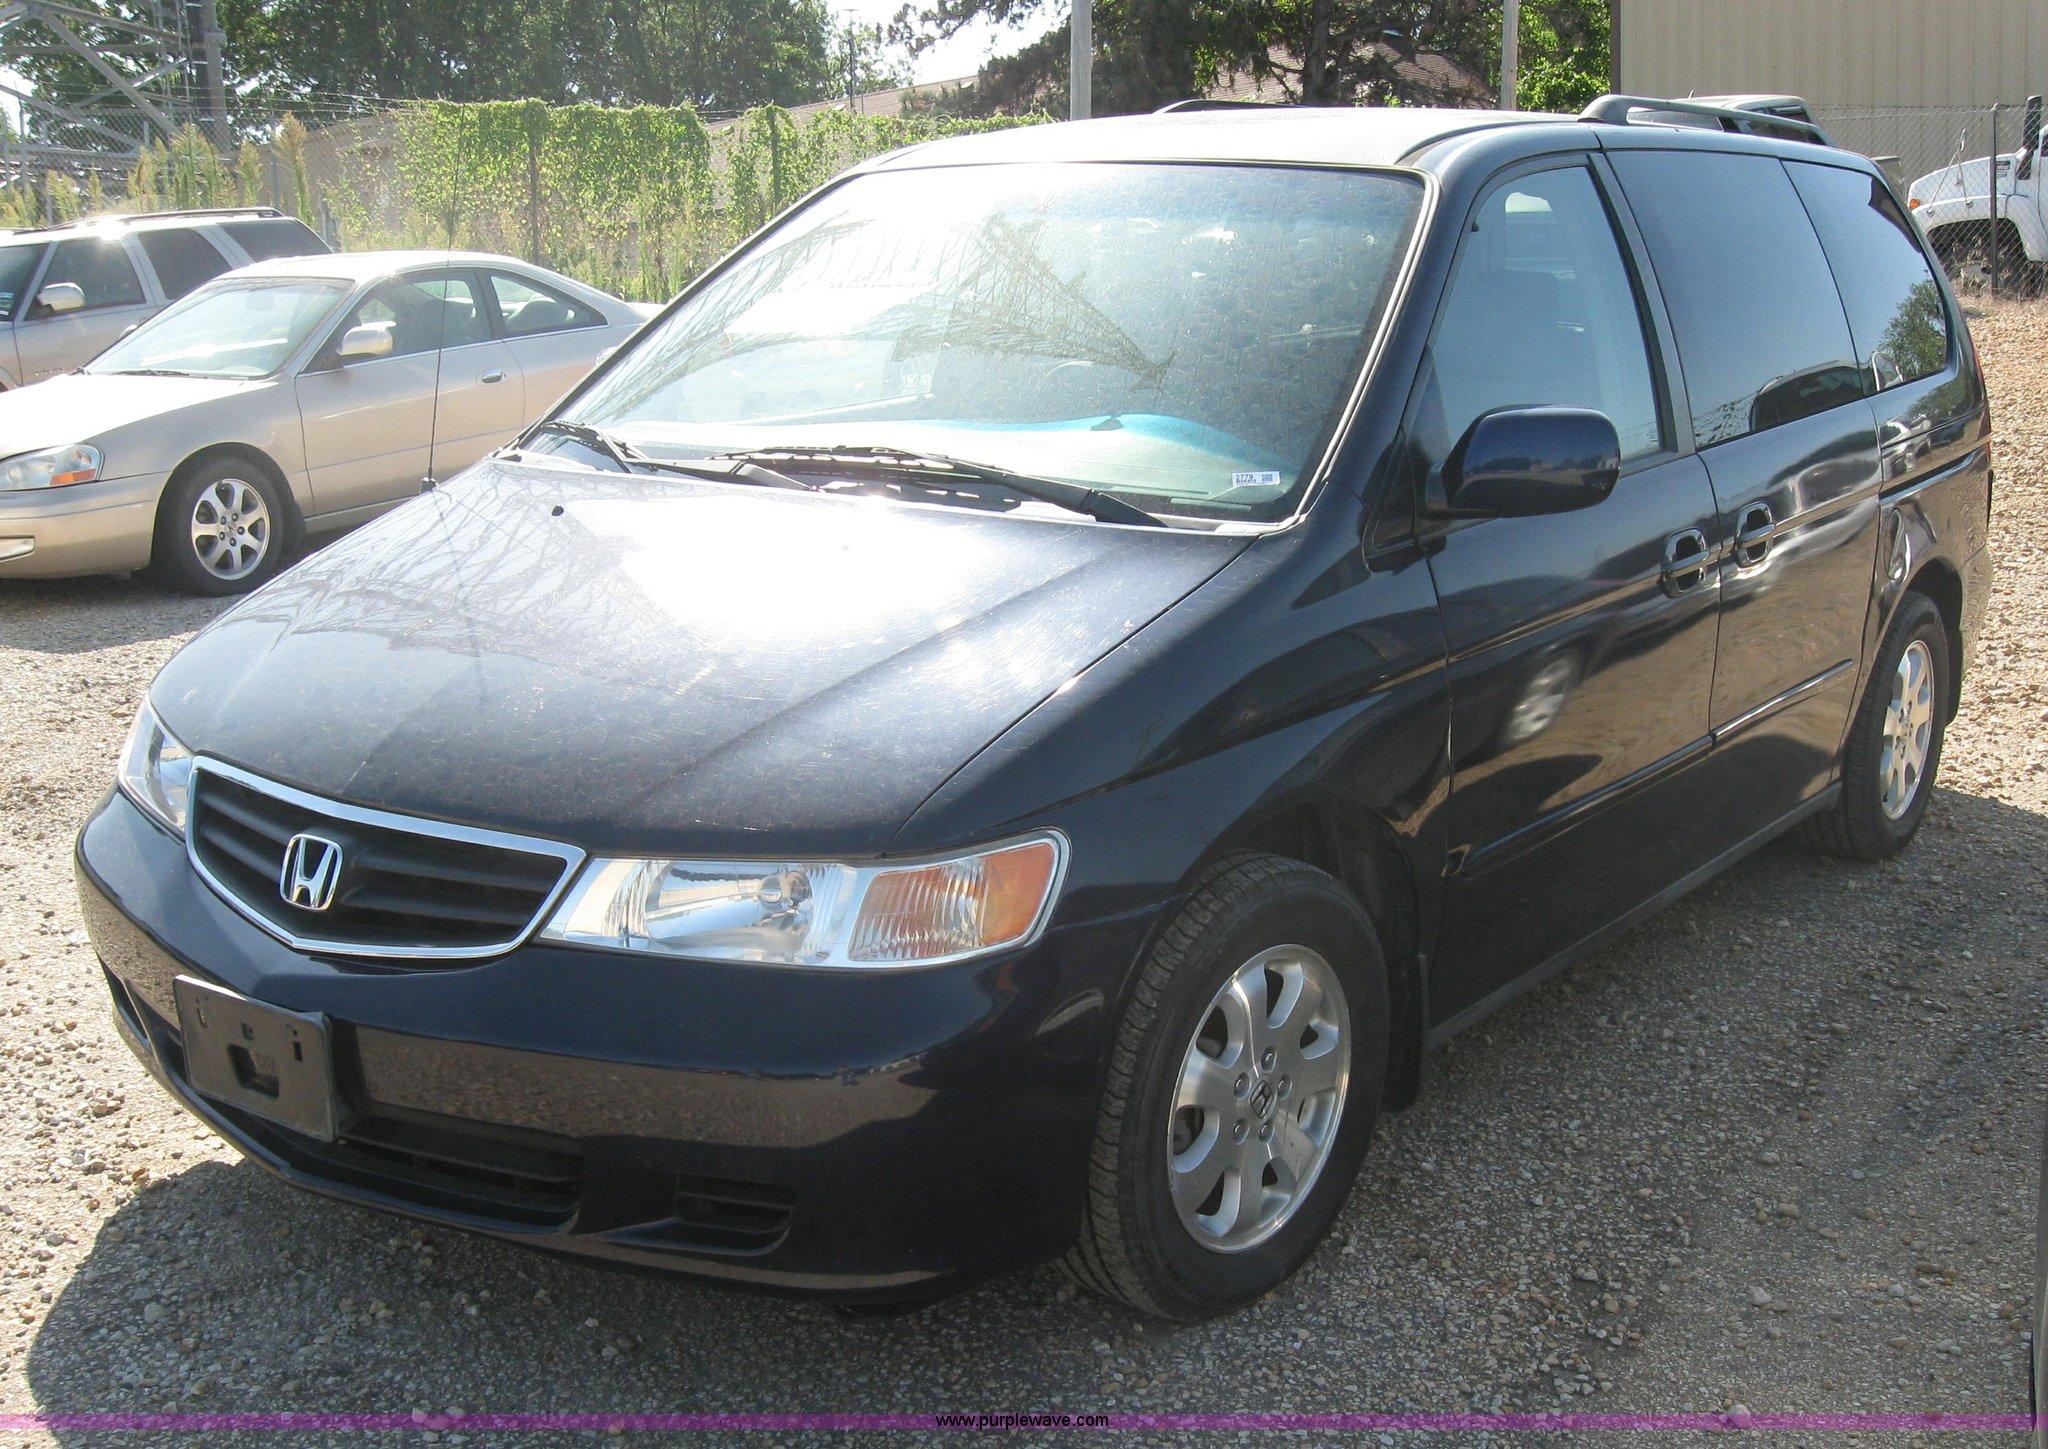 2003 Honda Odyssey Parts Tcc Wiring Diagram Ex Non Repairable Certificate 2048x1449